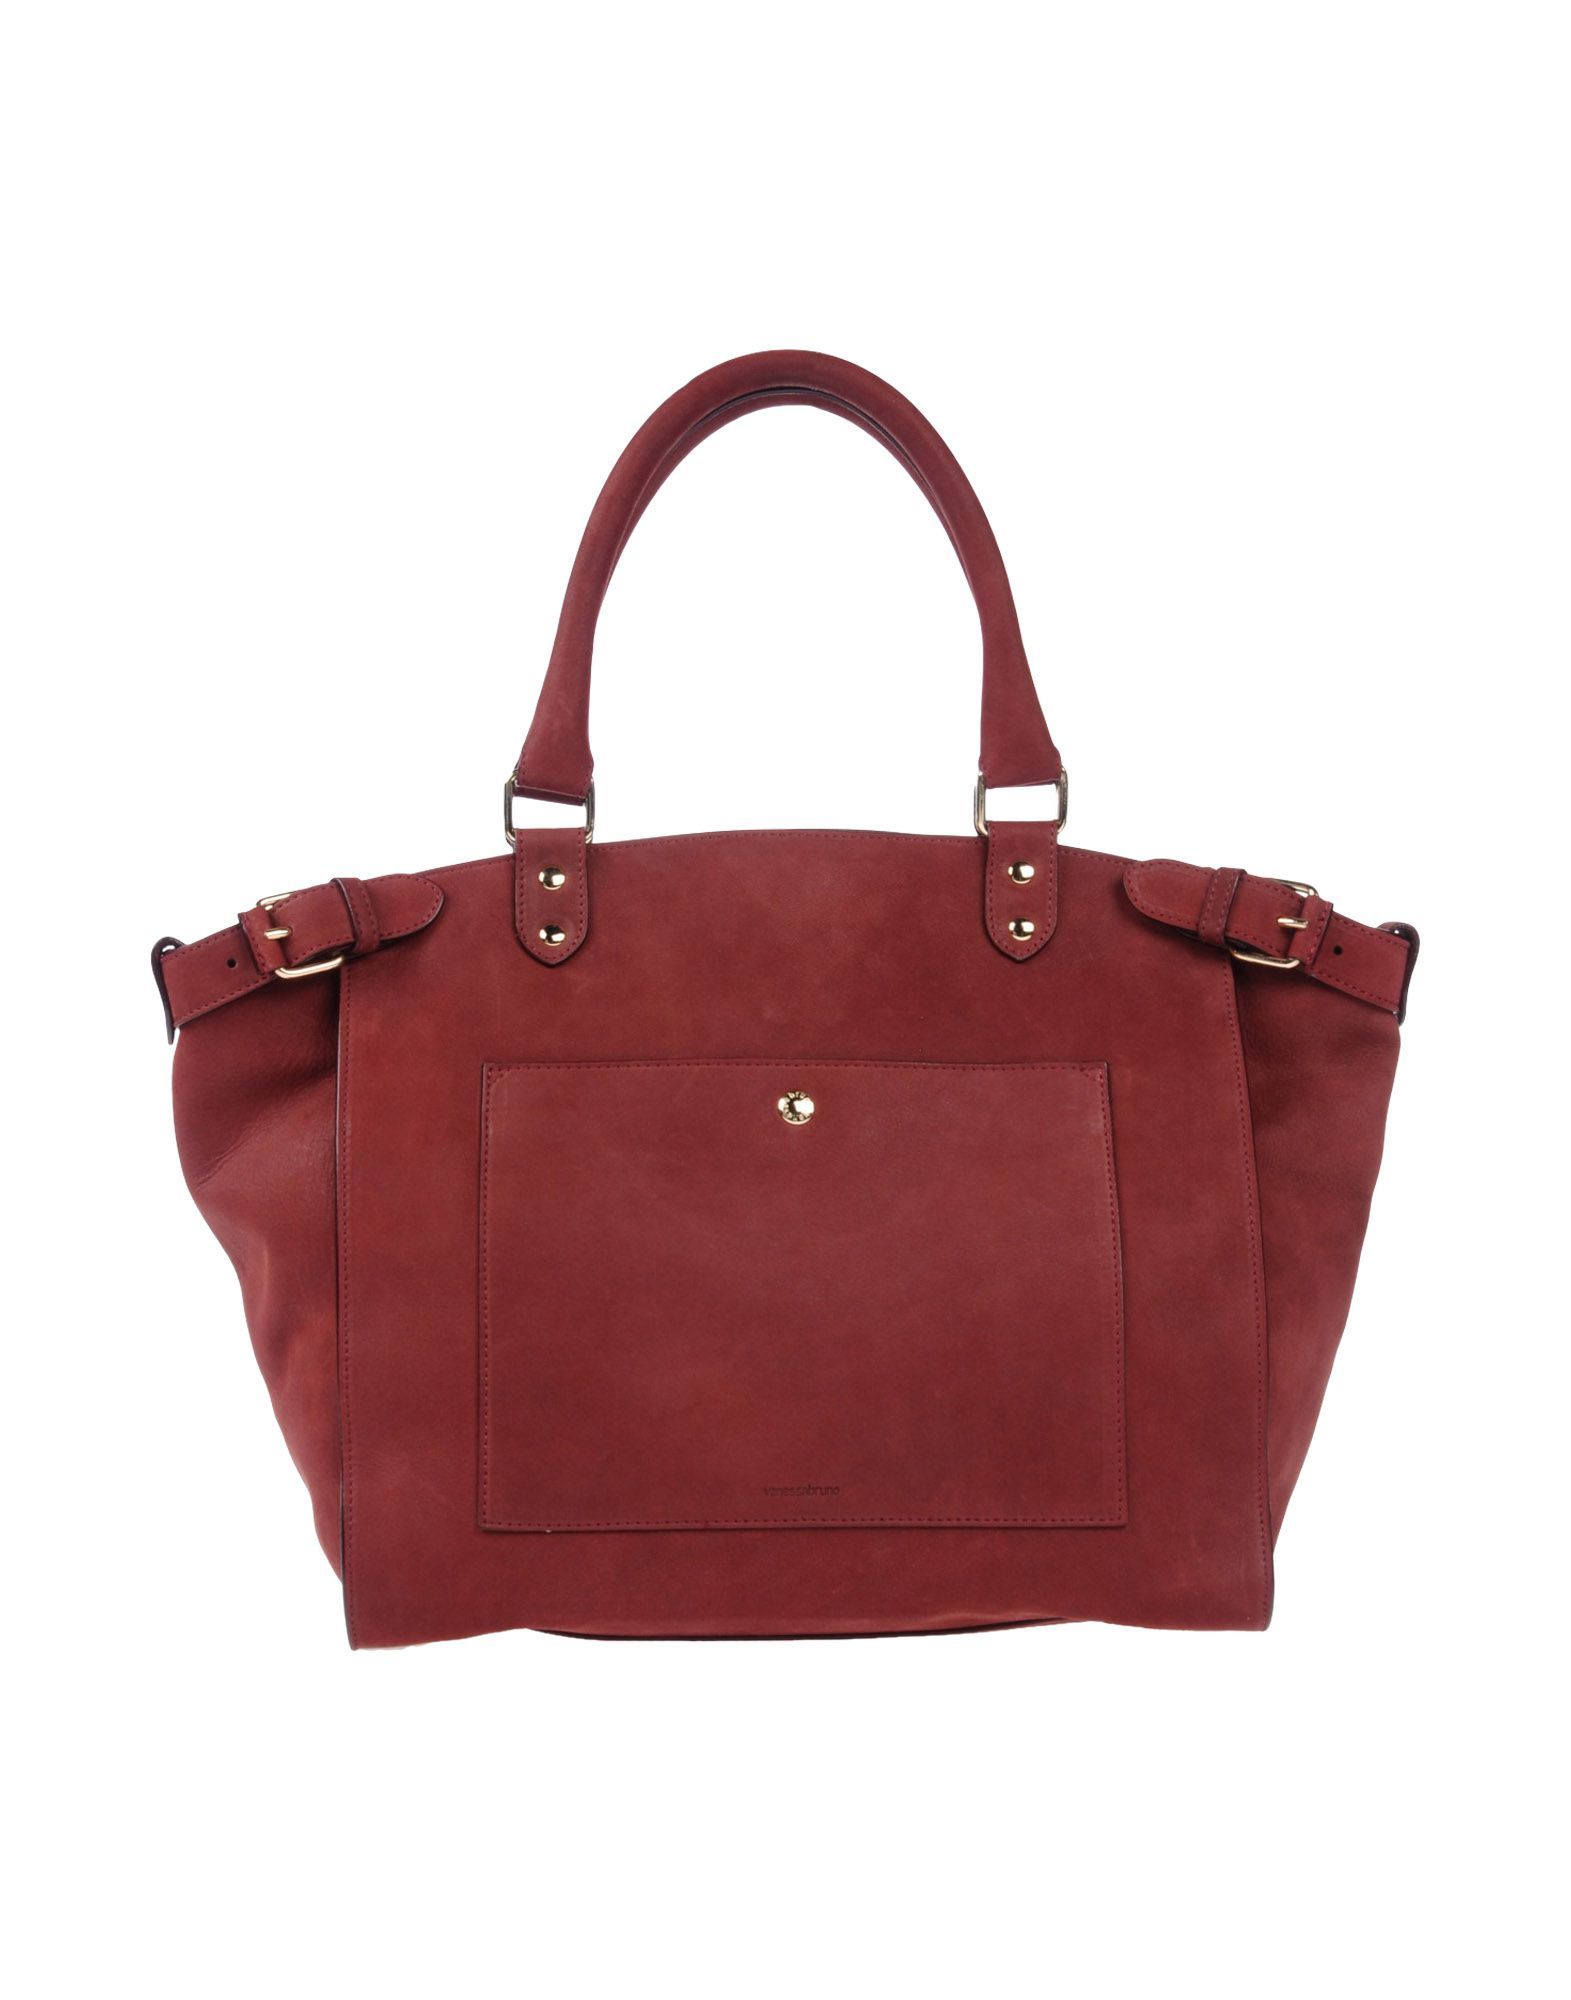 VANESSA BRUNO Сумка на руку сумка bruno rossi ml403p cenere